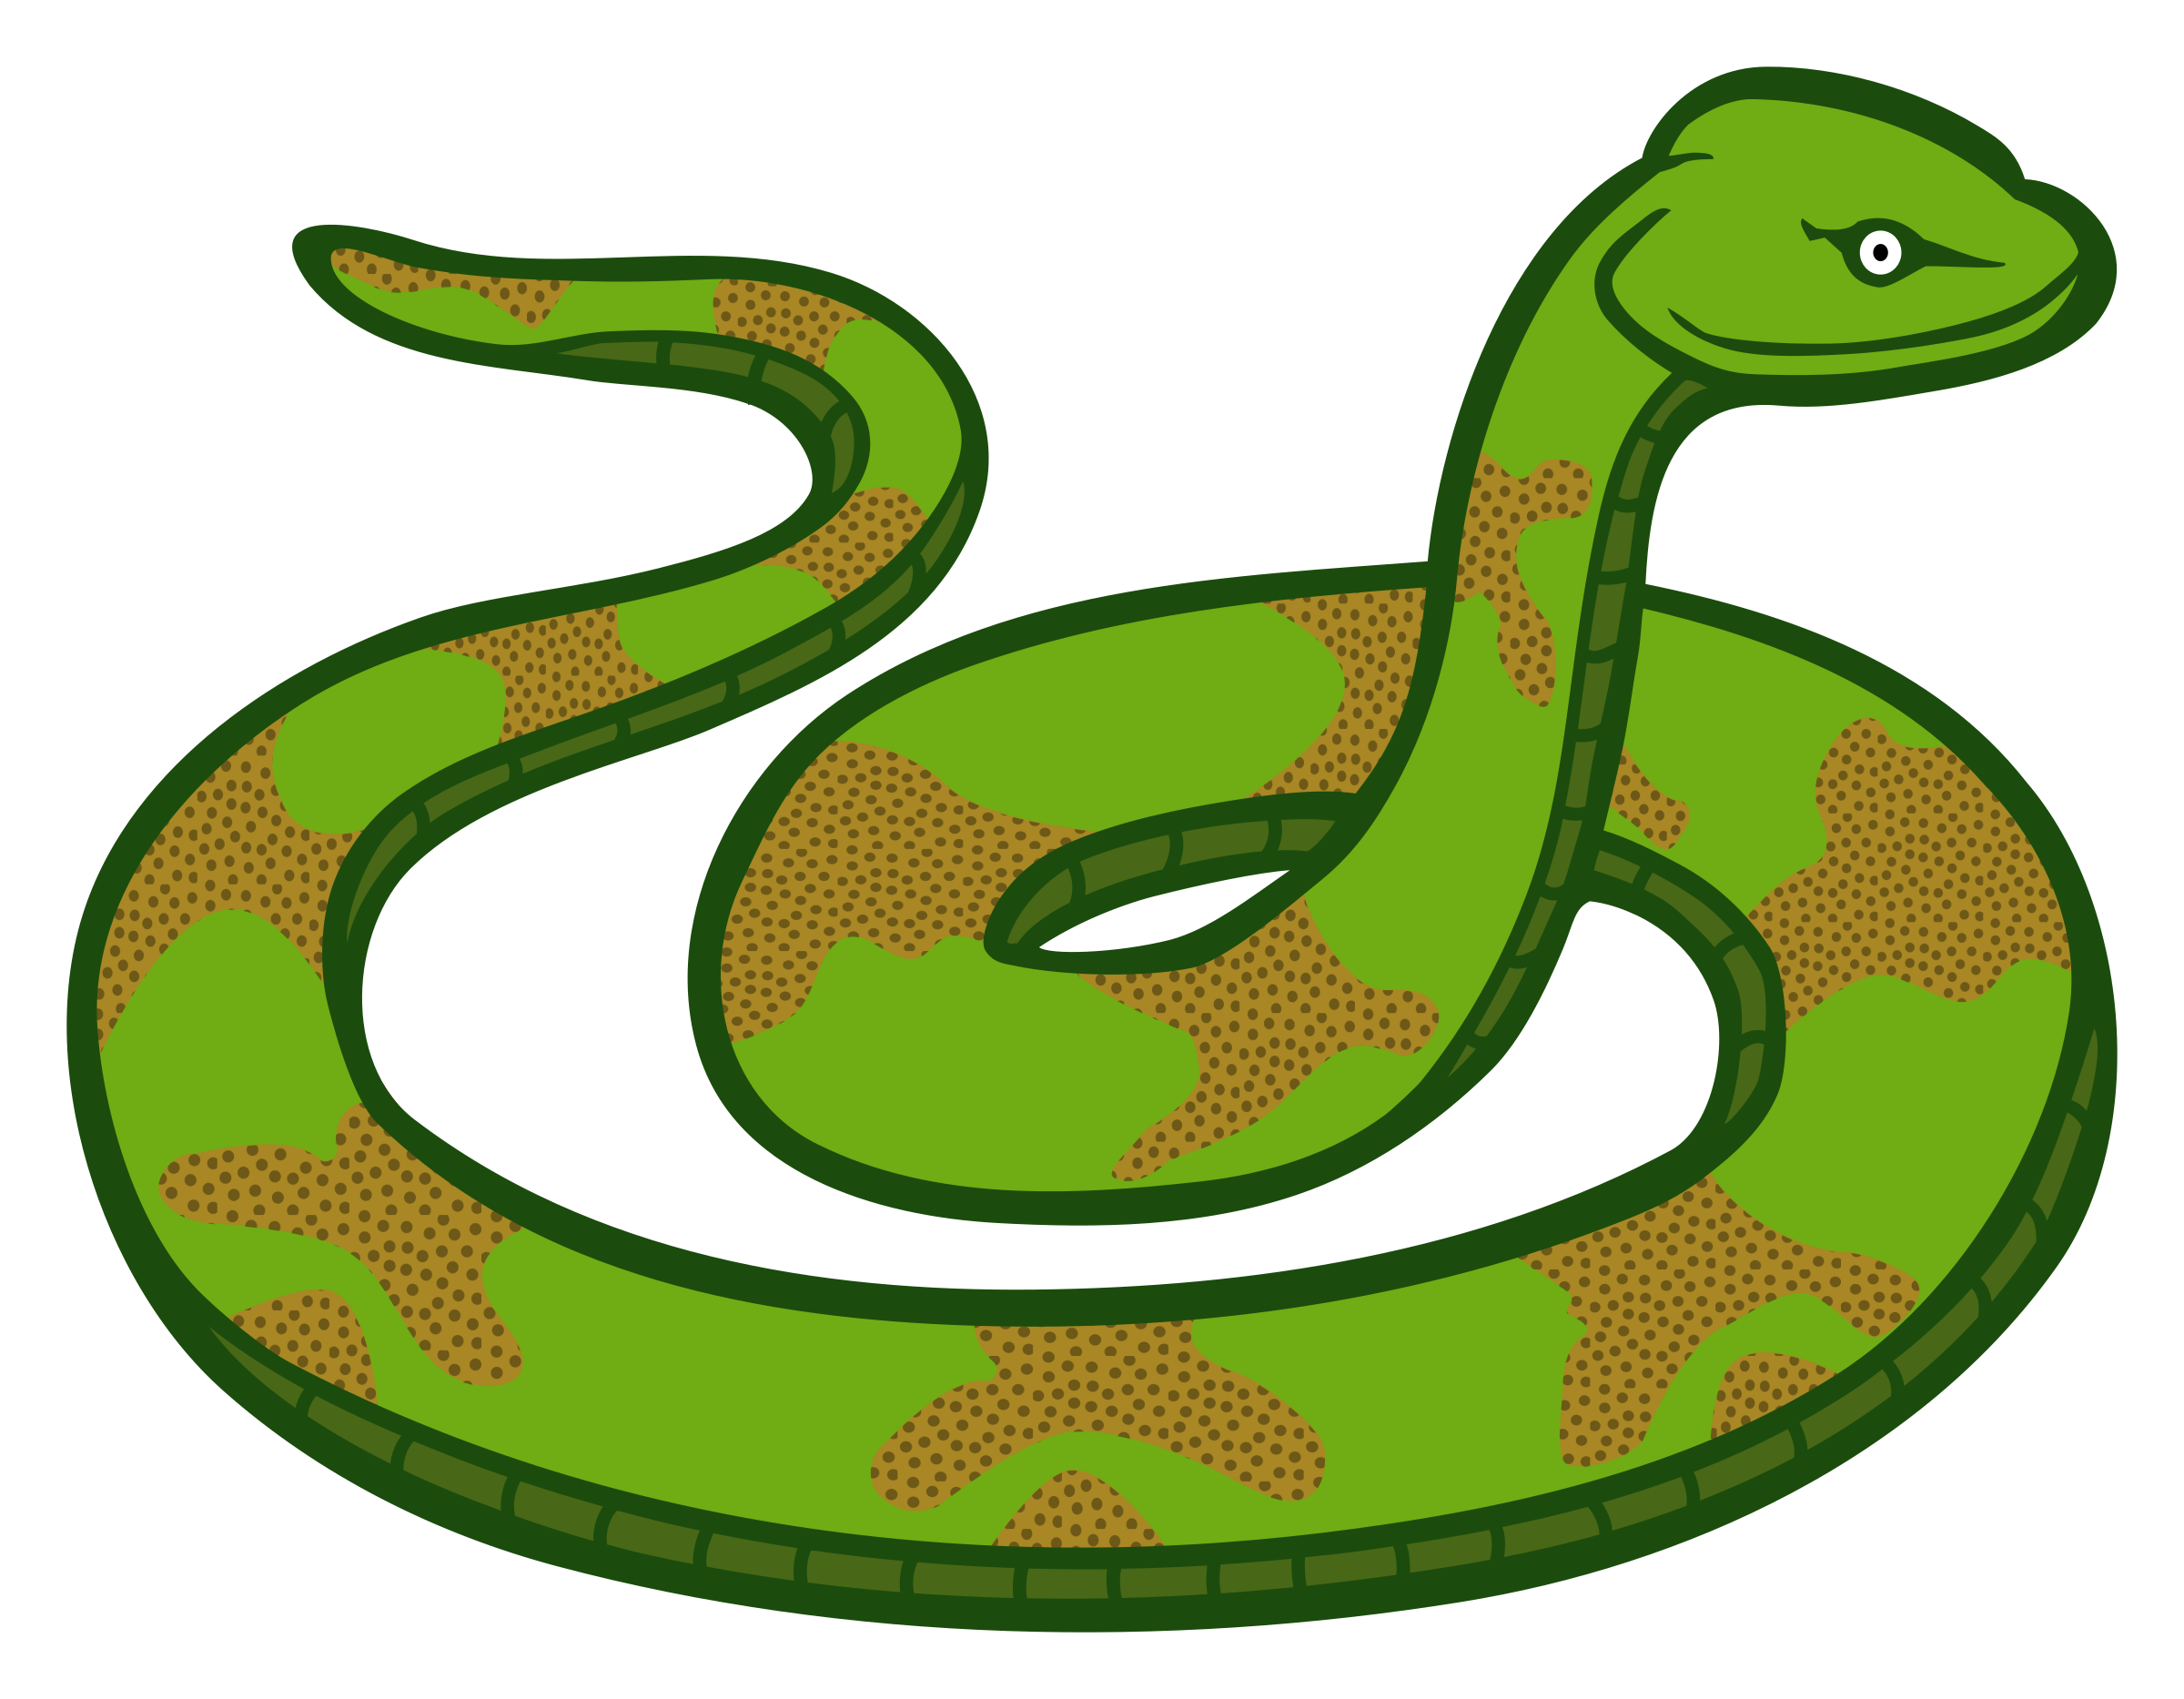 Transparent snake clipart 2